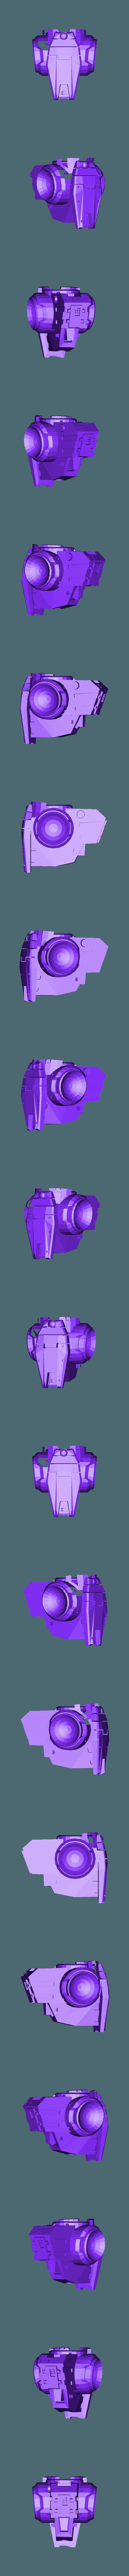 21Storm_Surge_Groin.obj Download free OBJ file Tempest Rush Mech • 3D printer model, Leesedrenfort